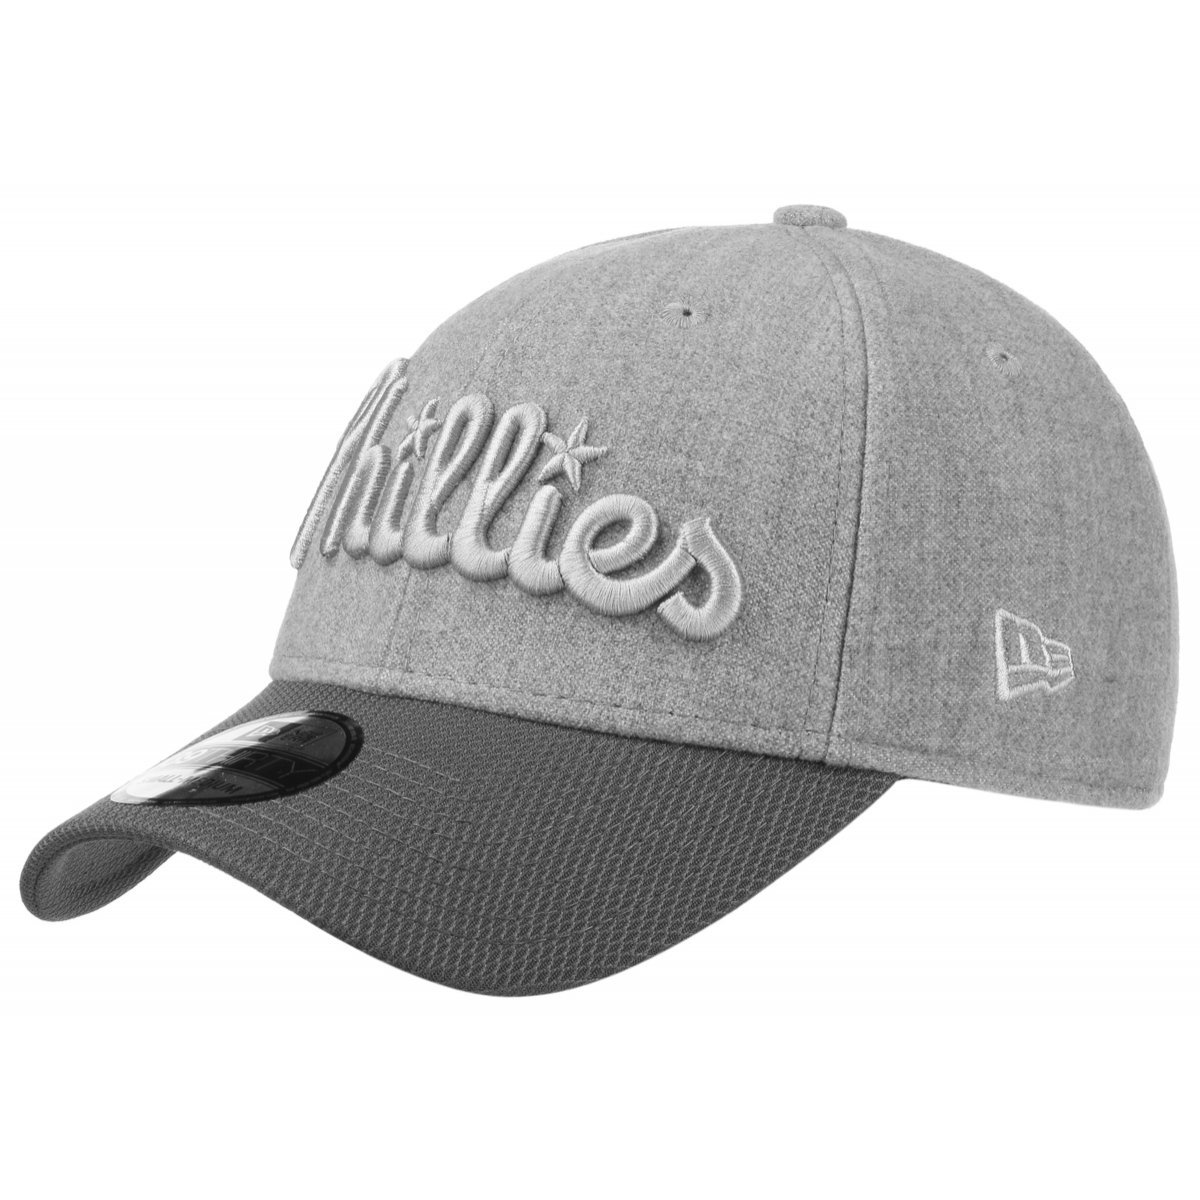 finest selection 286f9 6c7ca Stretch Melton Phillies Cap NEW ERA cap fitted cap (L XL (58-61) - grey)   Amazon.co.uk  Clothing